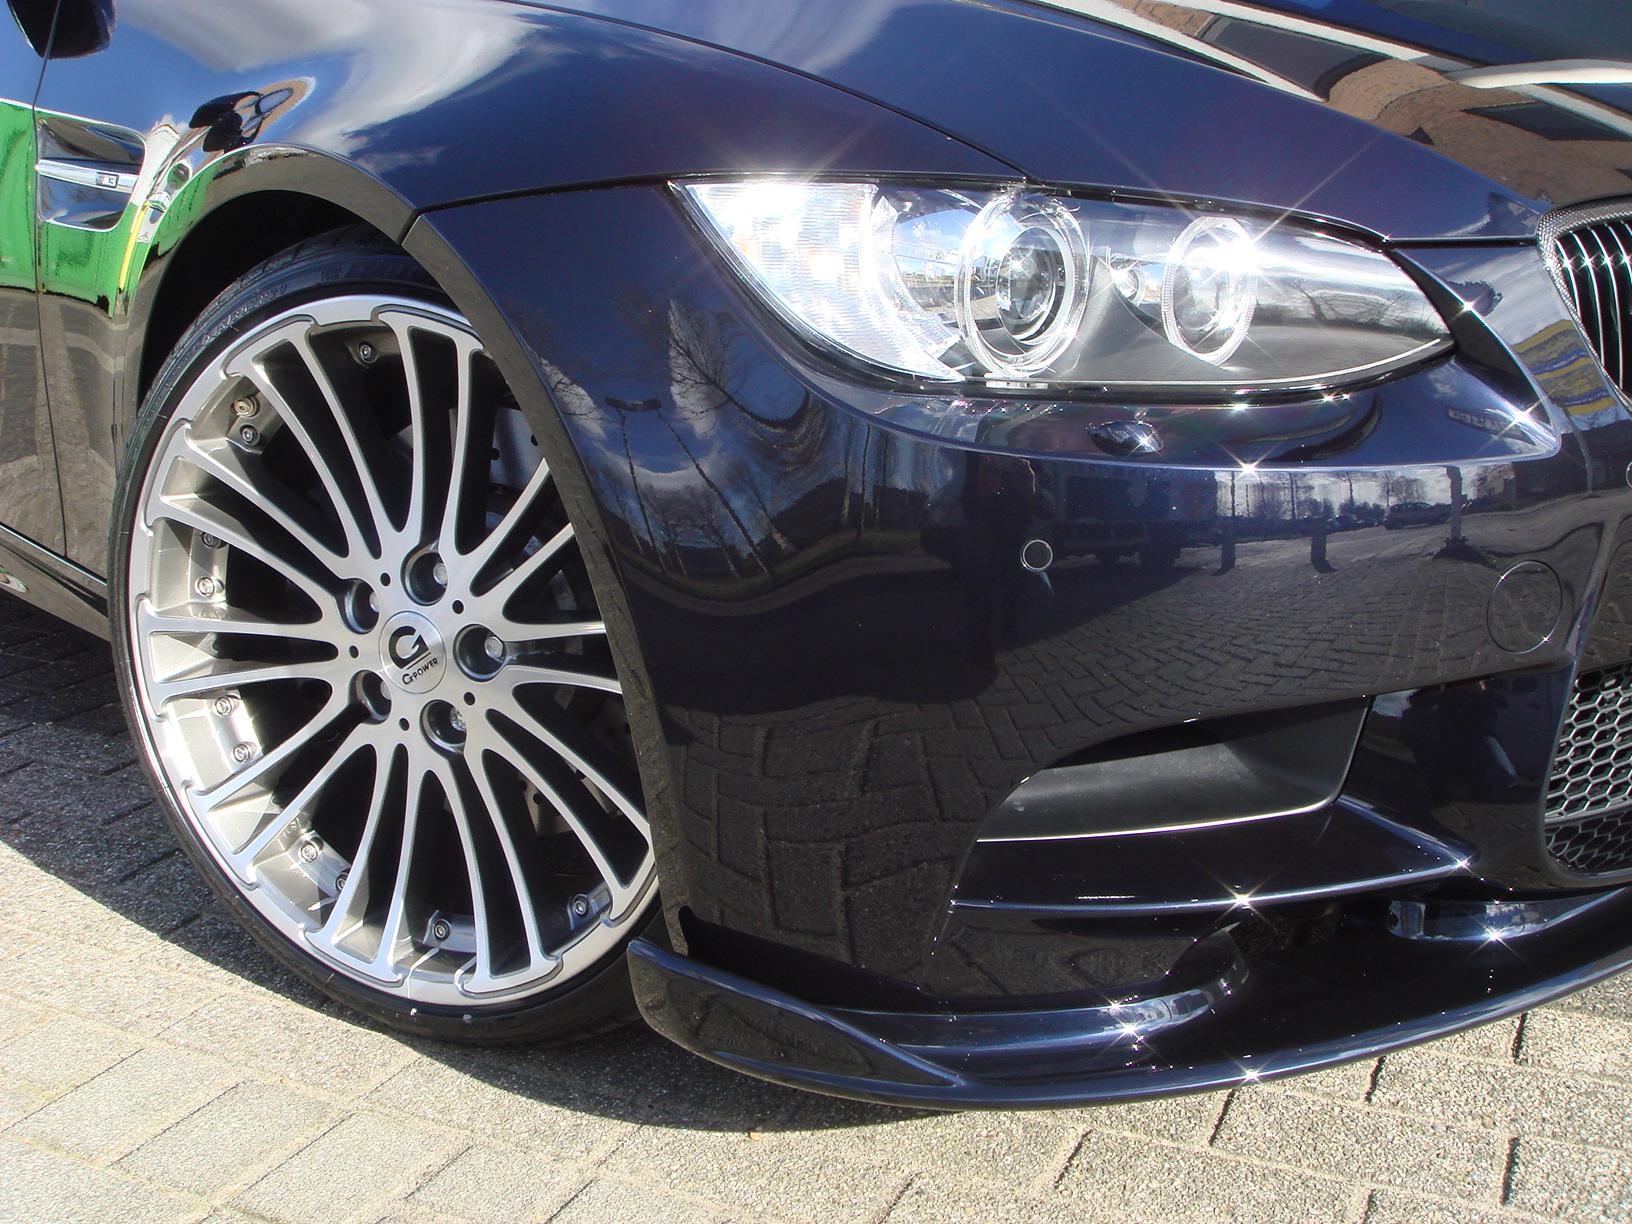 Modded jerez black M3 E92 pics-dsc01949aq9.jpg